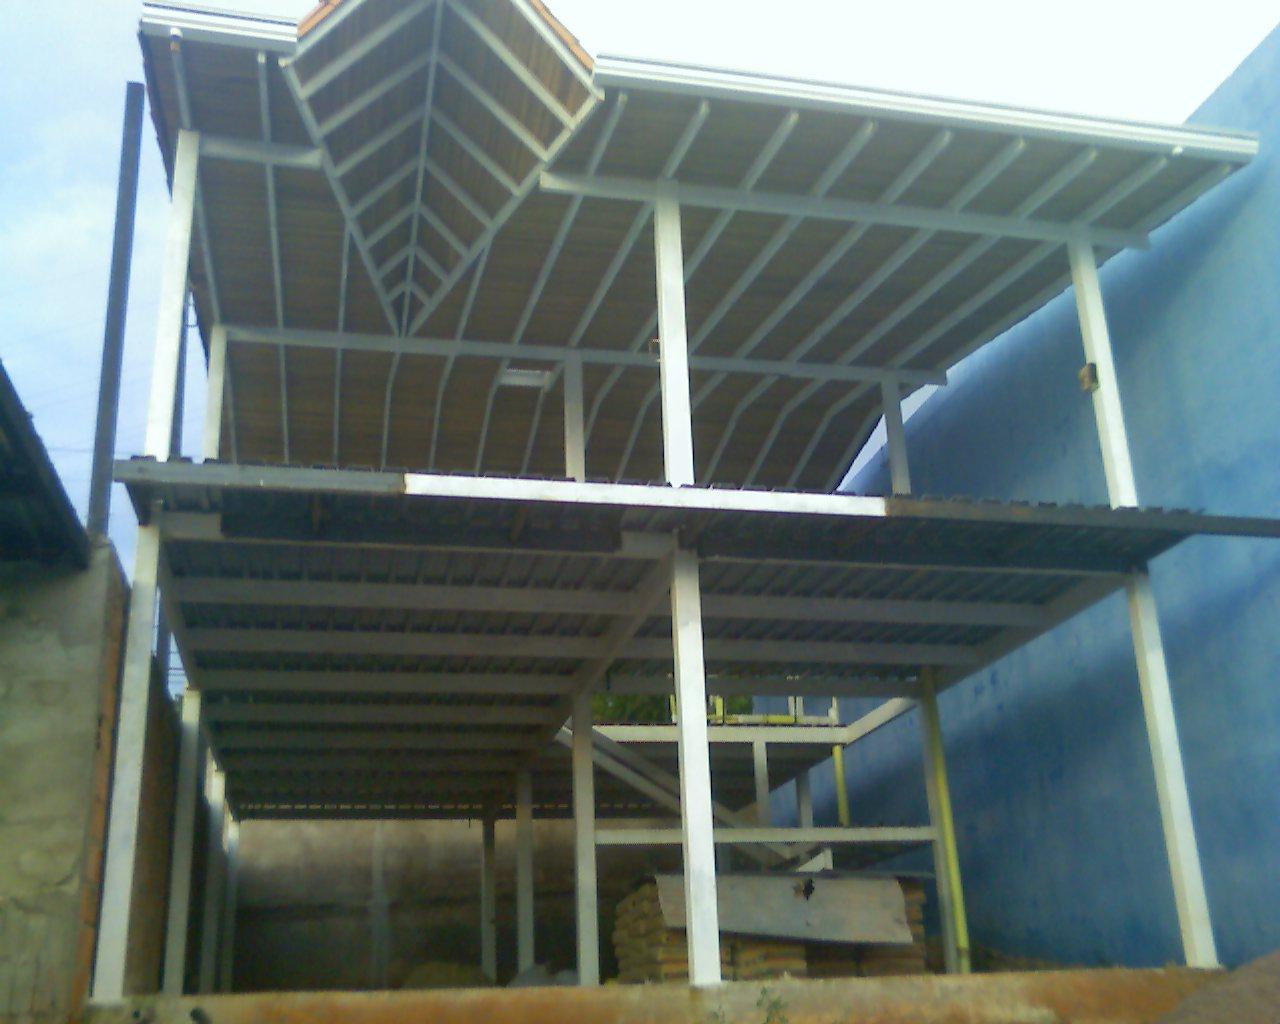 Constructora jsot c a kit metalicos para casas pre - Estructuras metalicas para casas ...